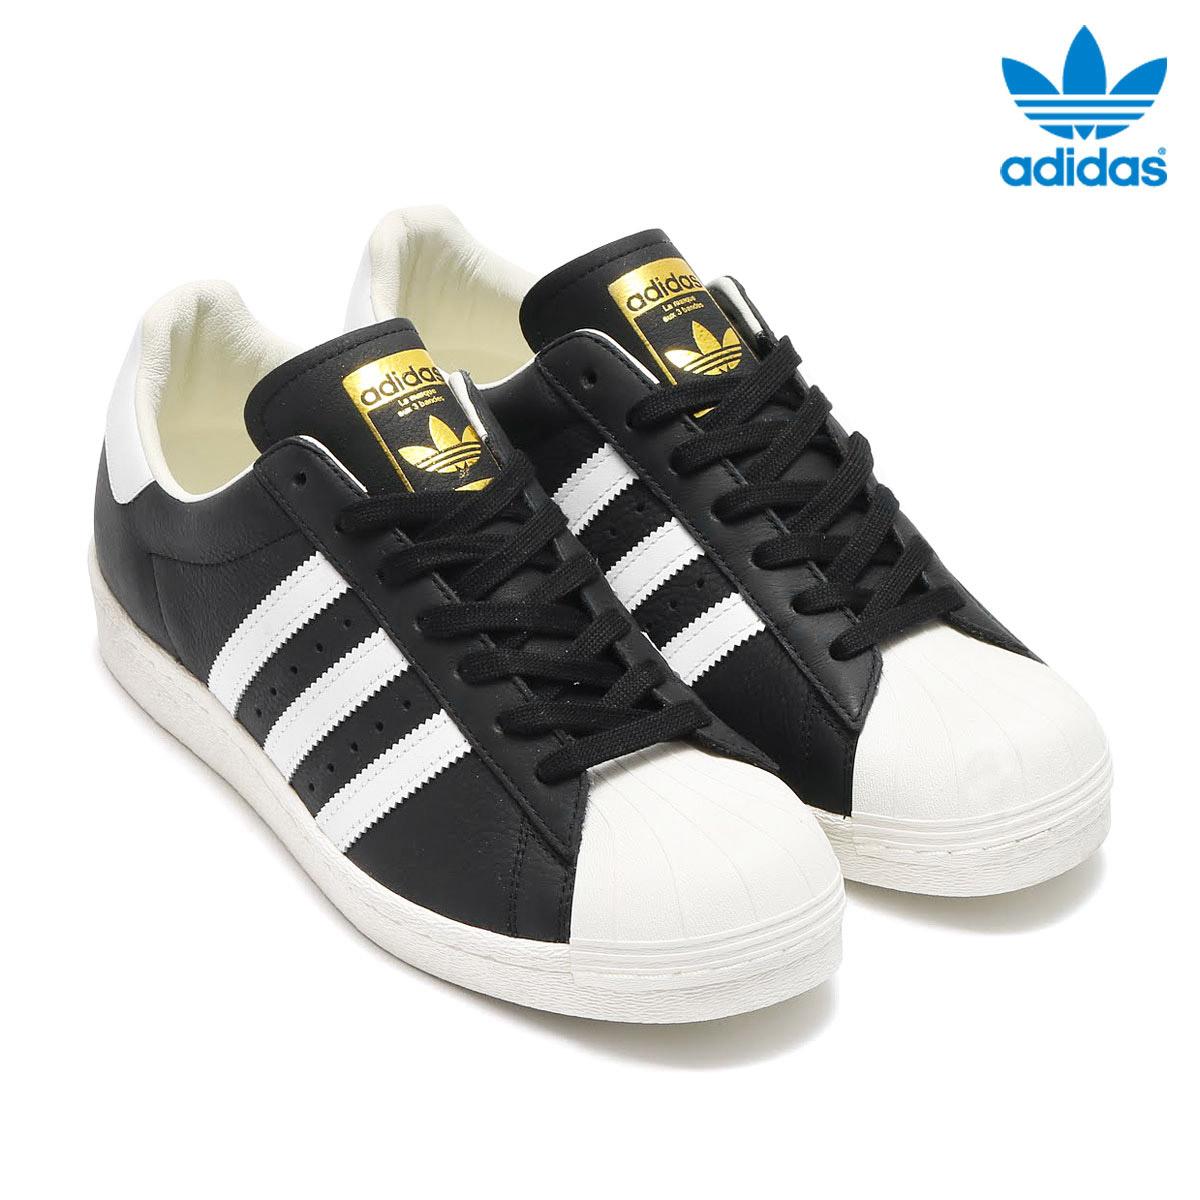 cheap discount Adidas Superstar 80s Metal Toe W Mens White Rose